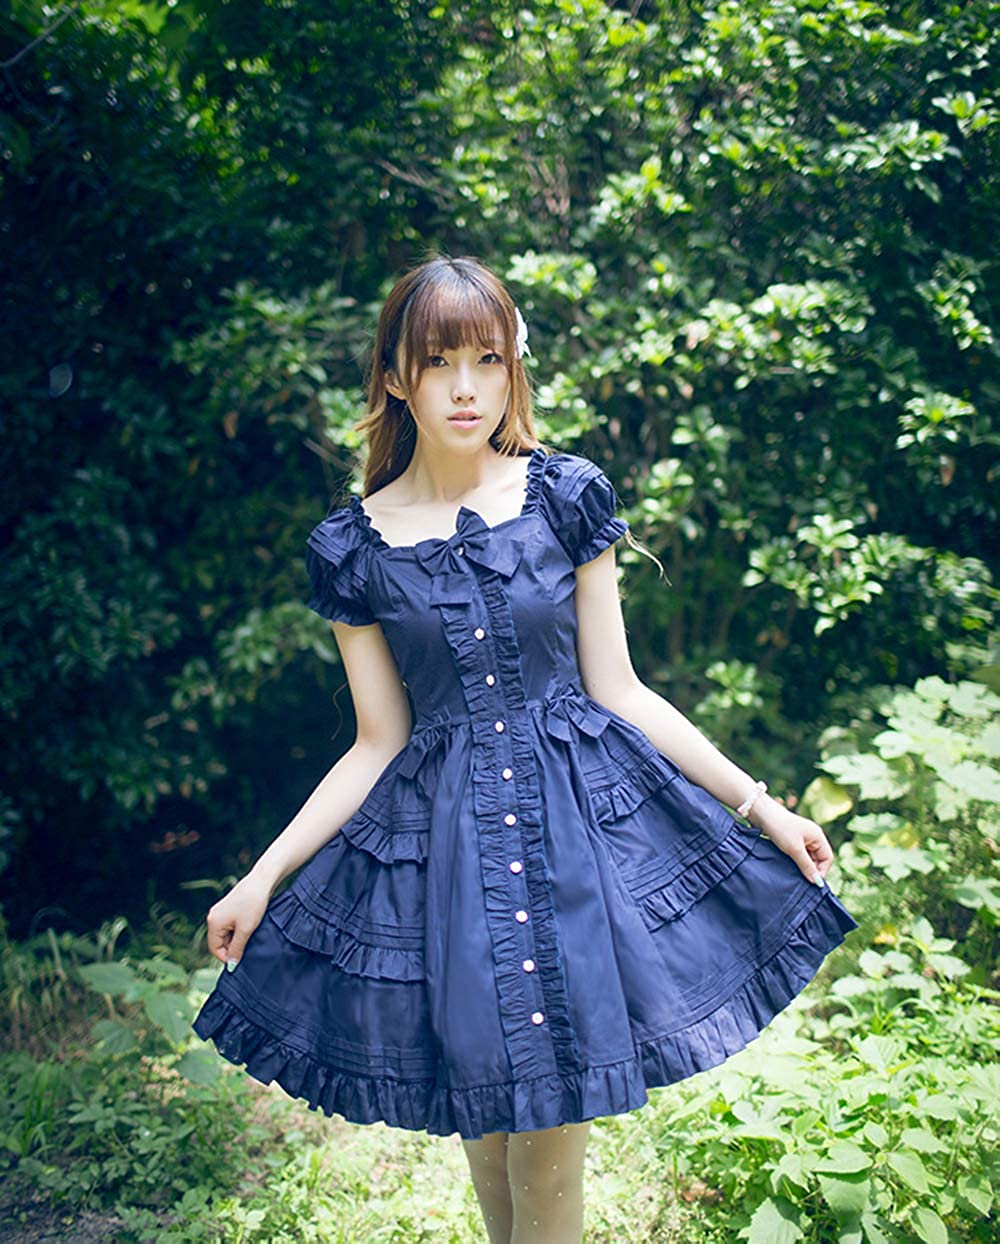 Mcttui Dress lolita clothes Lolita Dress Streetwear Shirt Women Dress Mini A-Line Bow Design Full Length Sailor Collar Patchwork JK High Waist Preppy Style Students Harajuku Lovely New